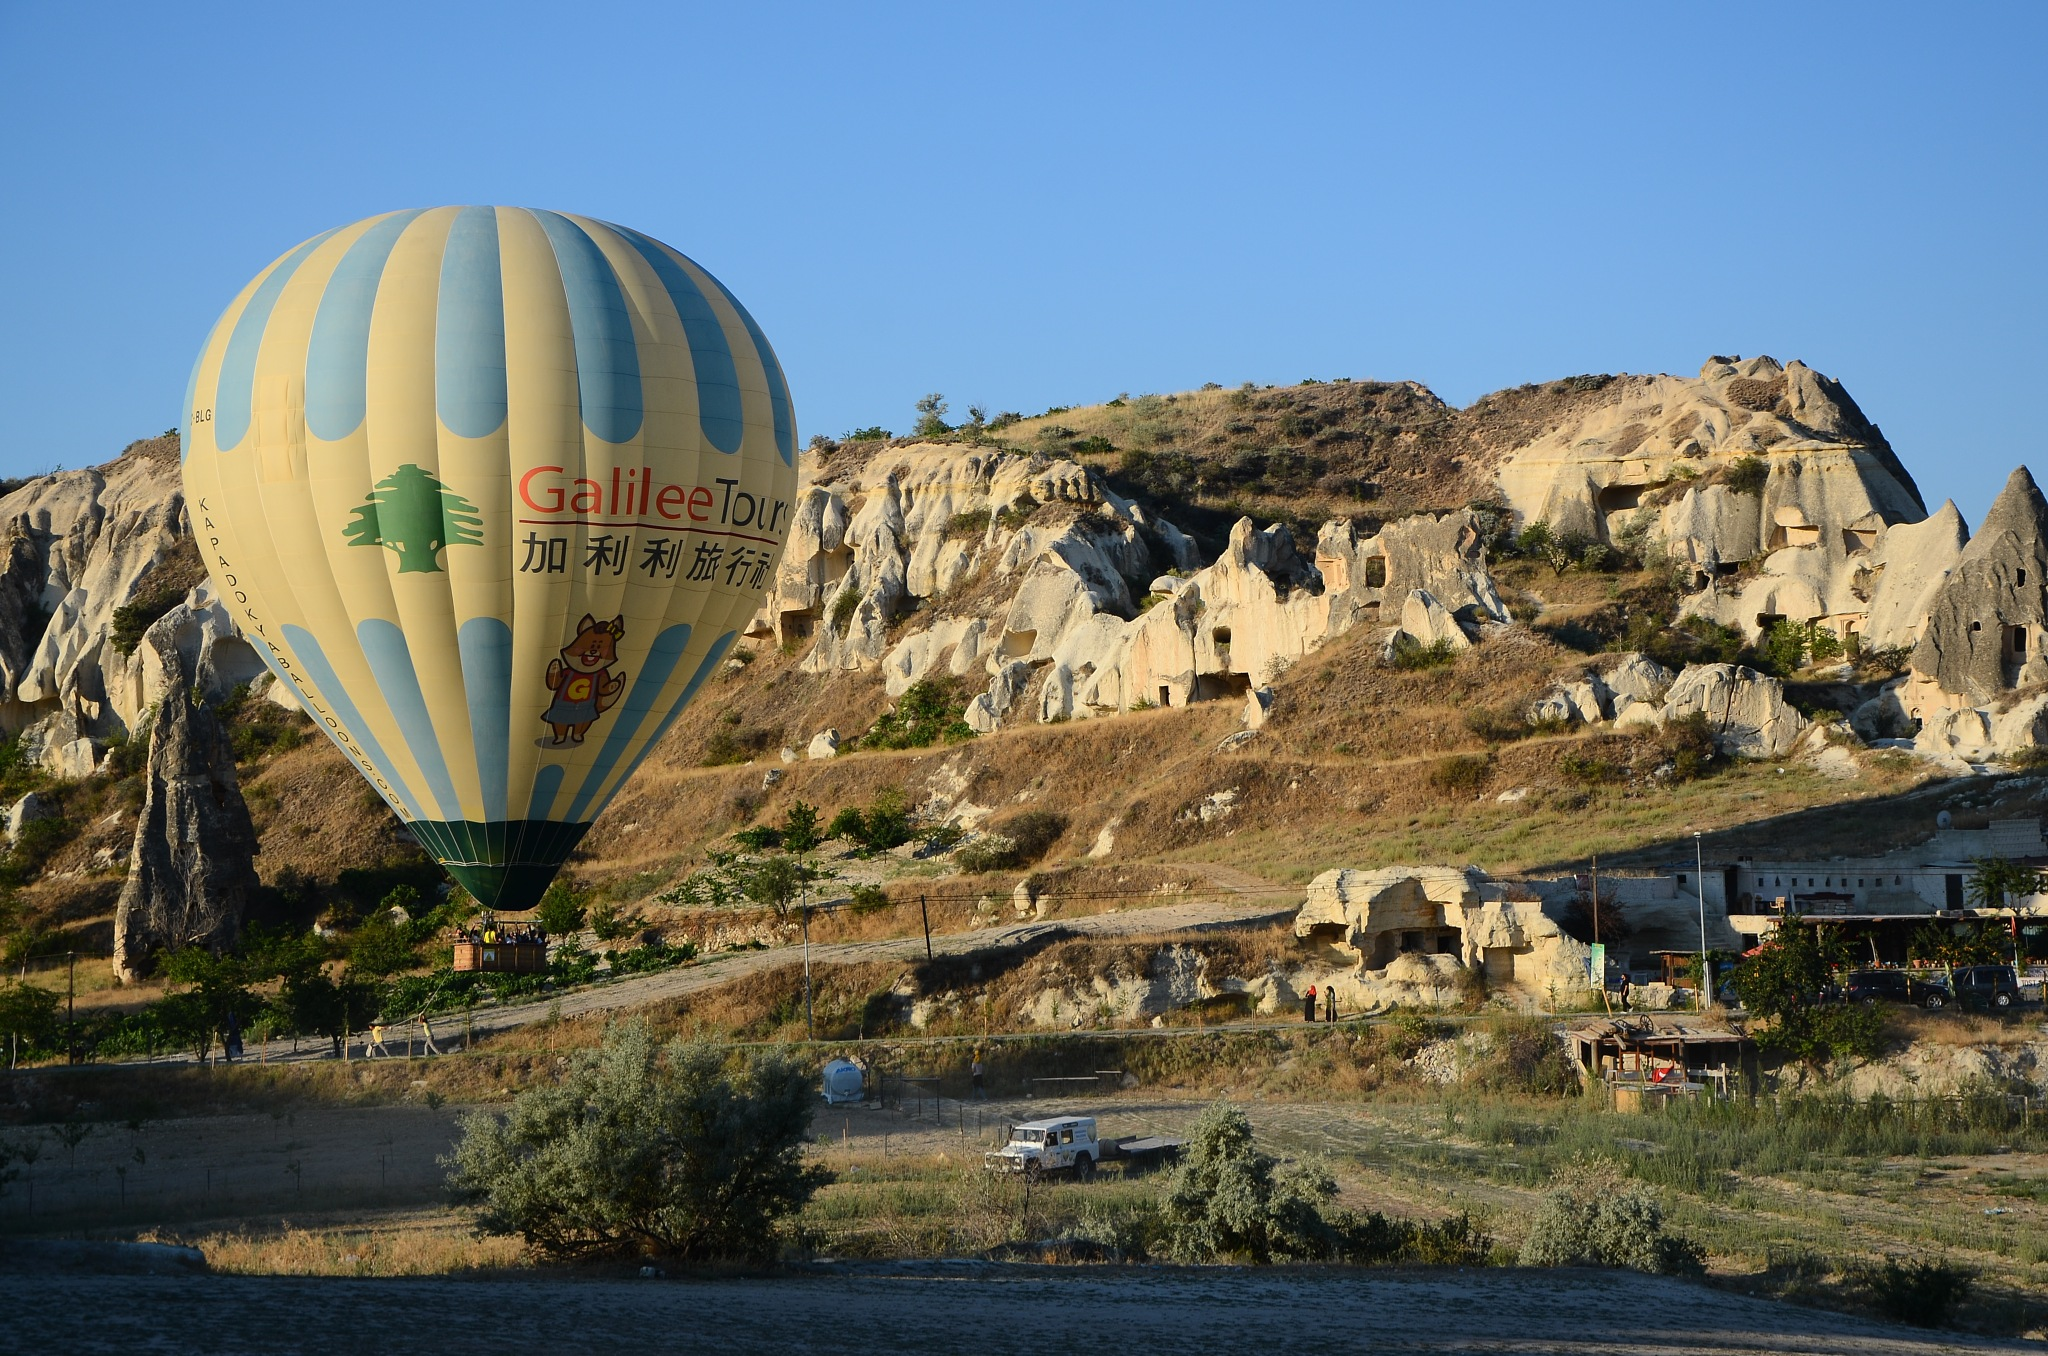 Balon by Aliserit